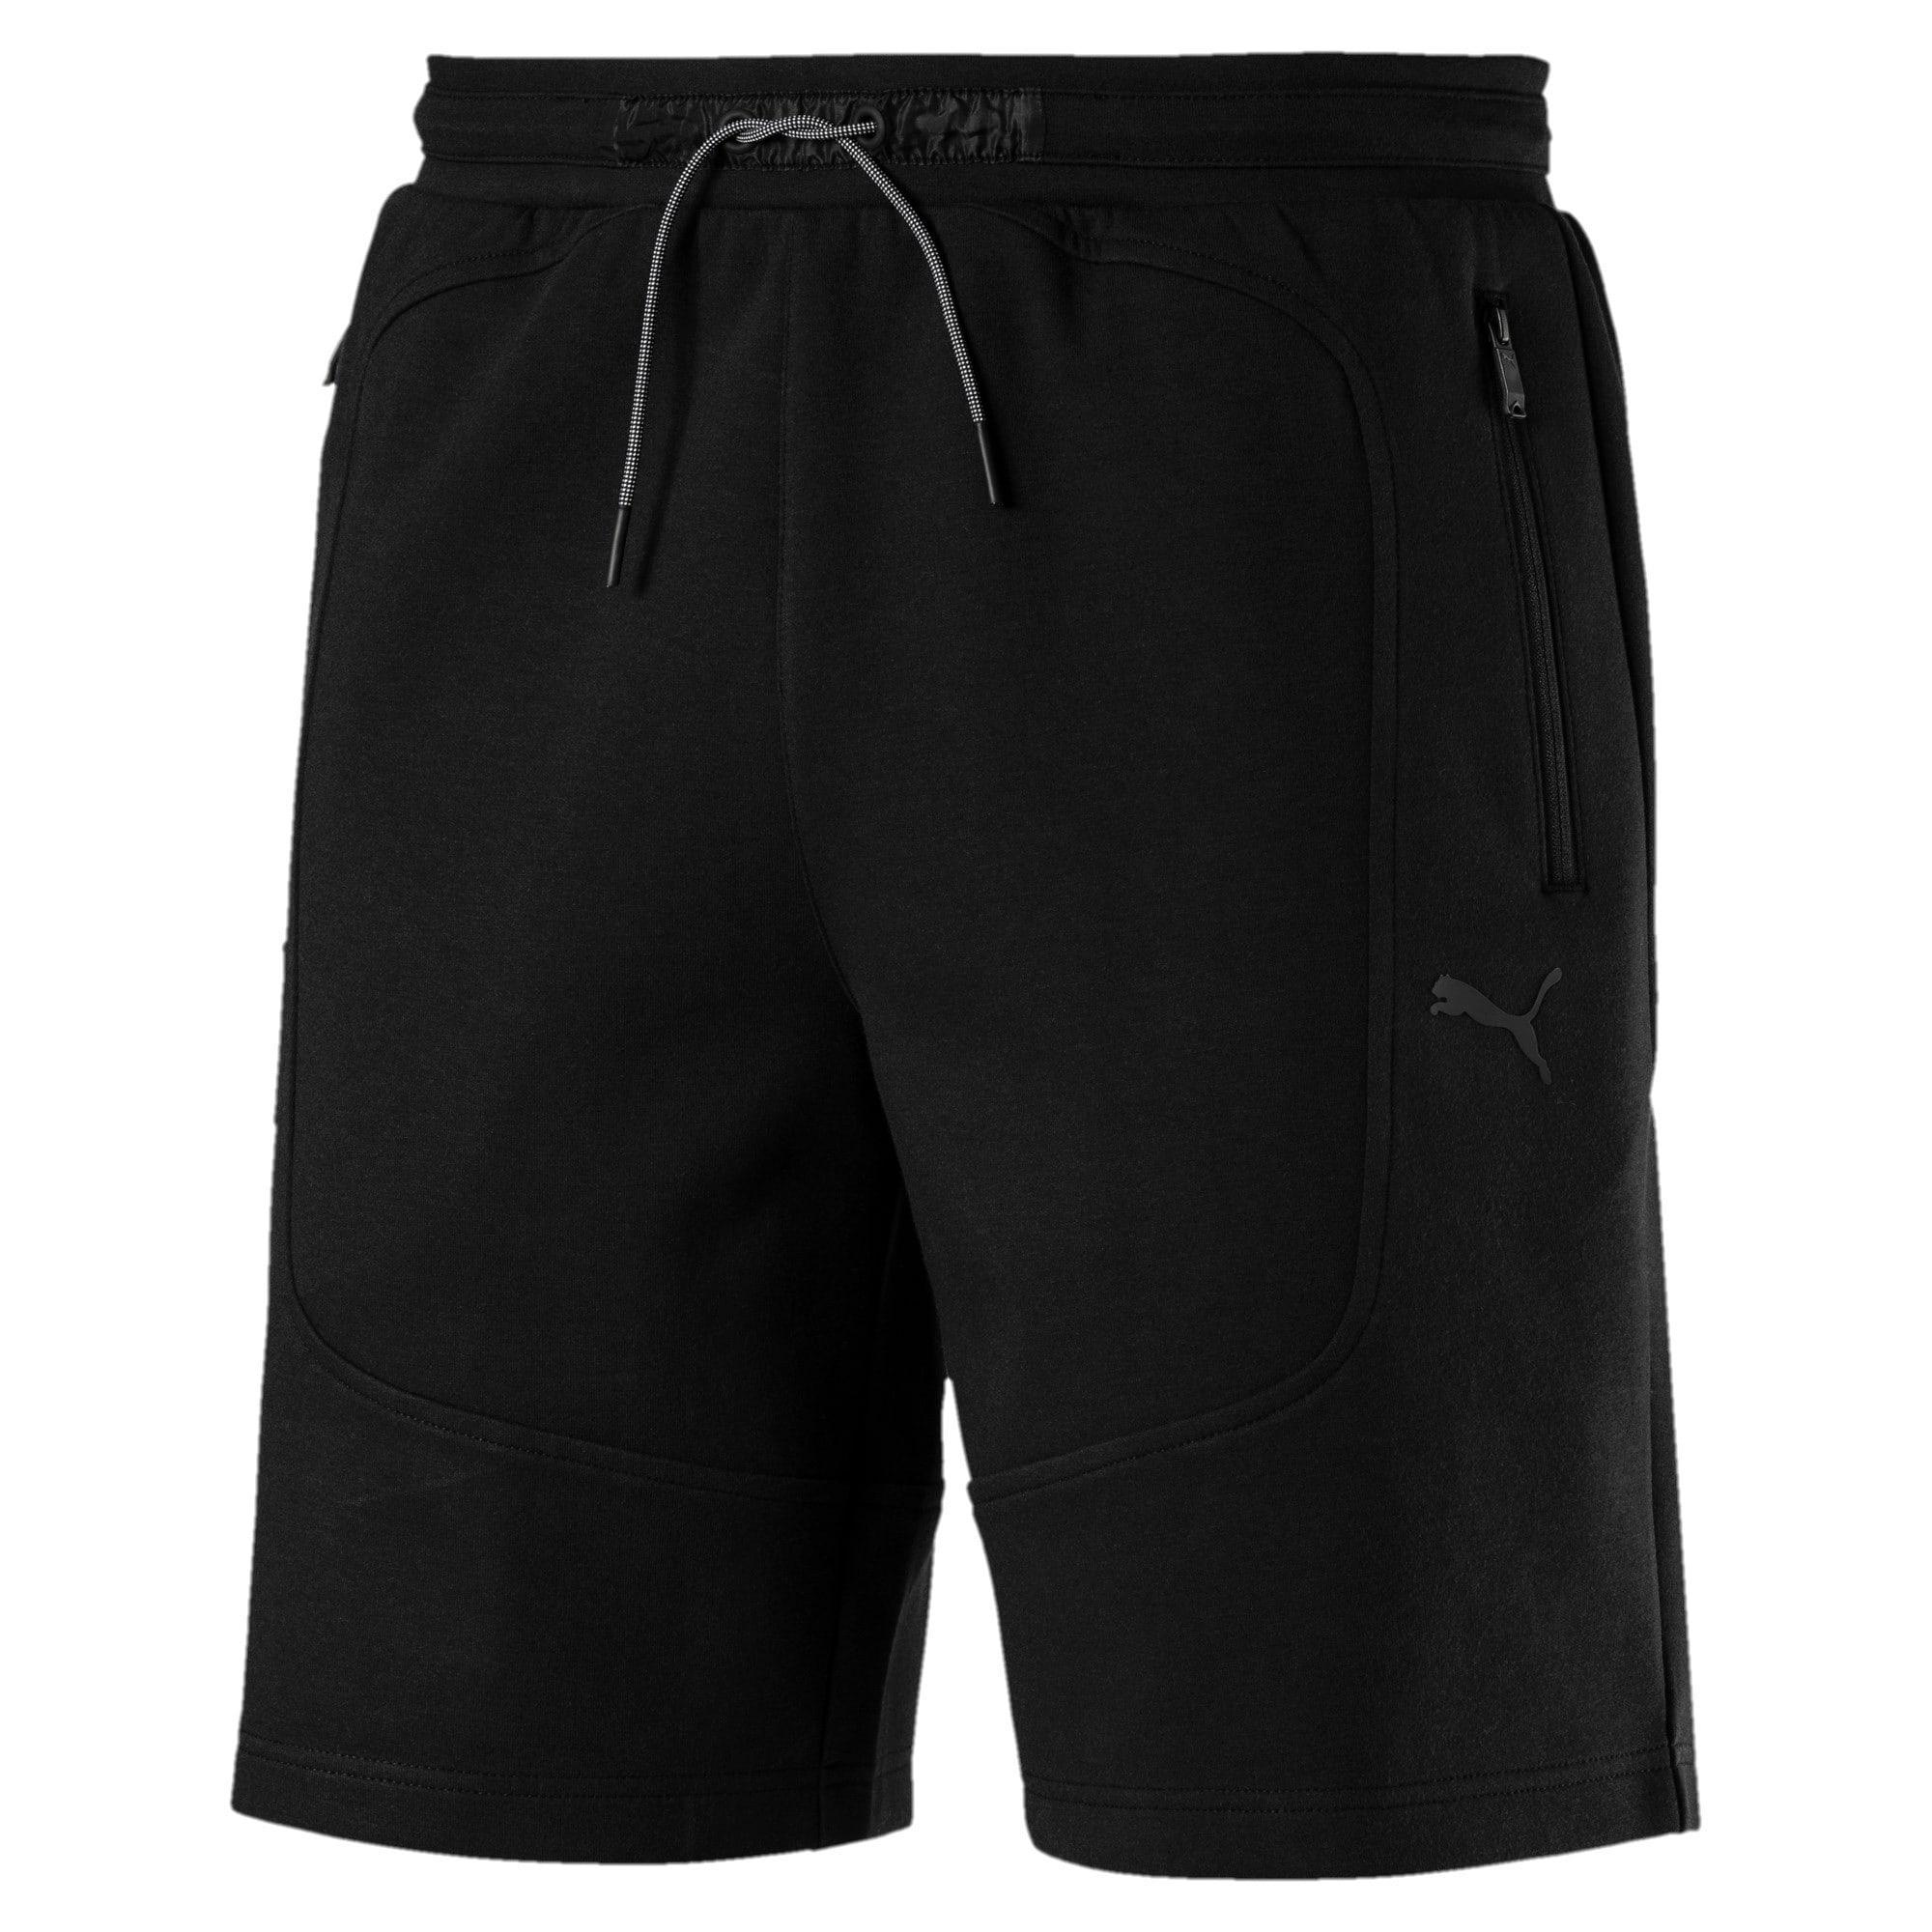 Thumbnail 2 of Ferrari Knitted Men's Shorts, Puma Black, medium-IND